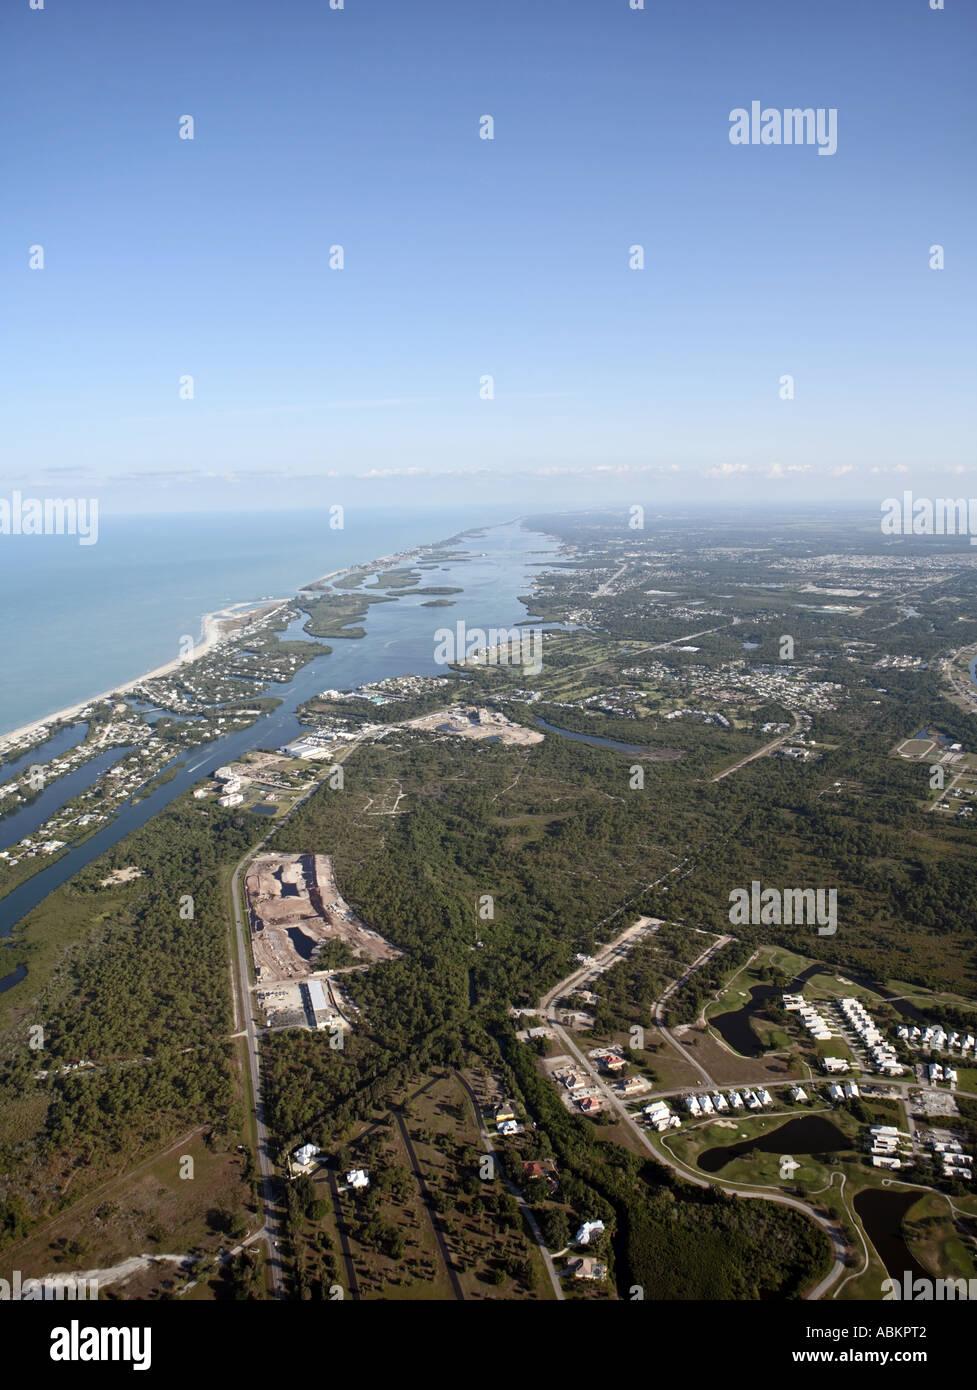 Aerial photo of North Port, Rotonda, Bocilla Island, Thorton